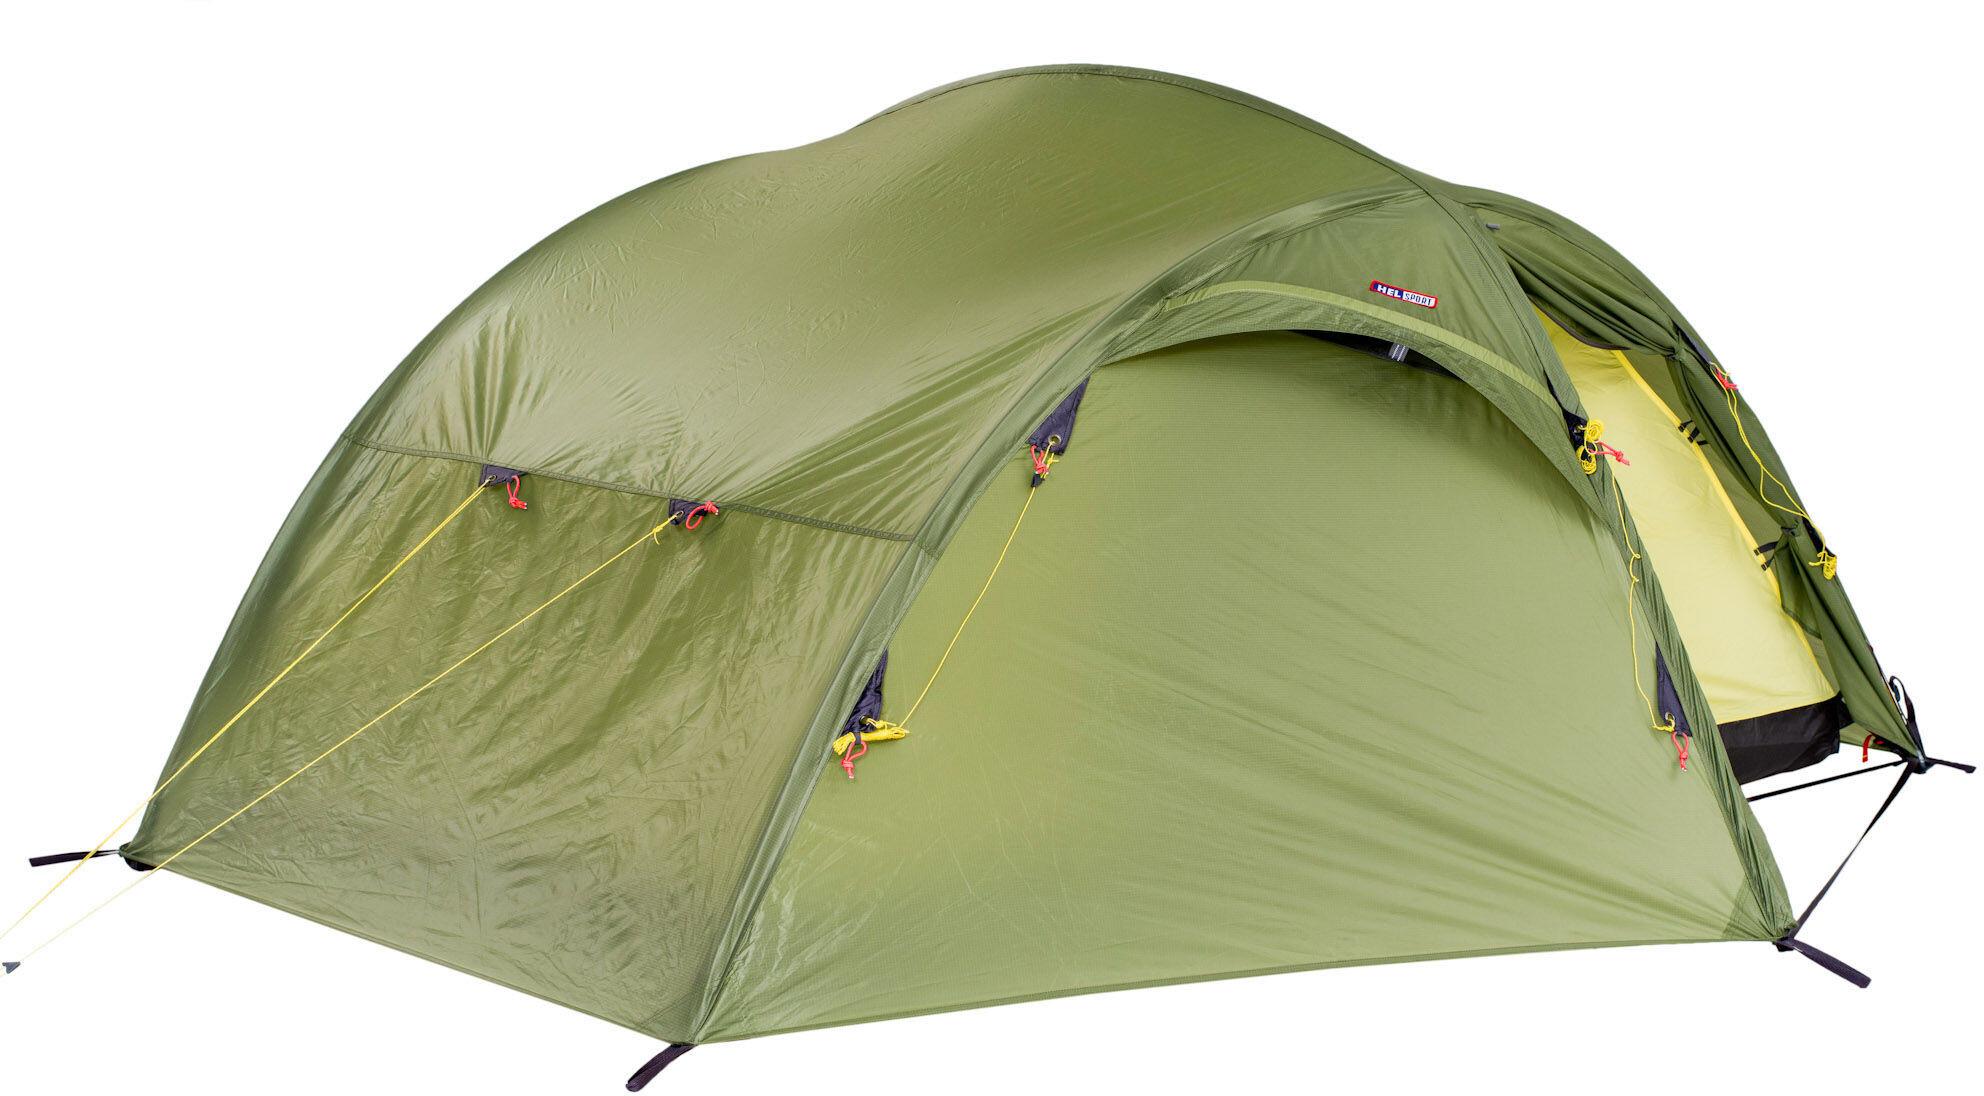 Helsport Reinsfjell Pro 2 Tent